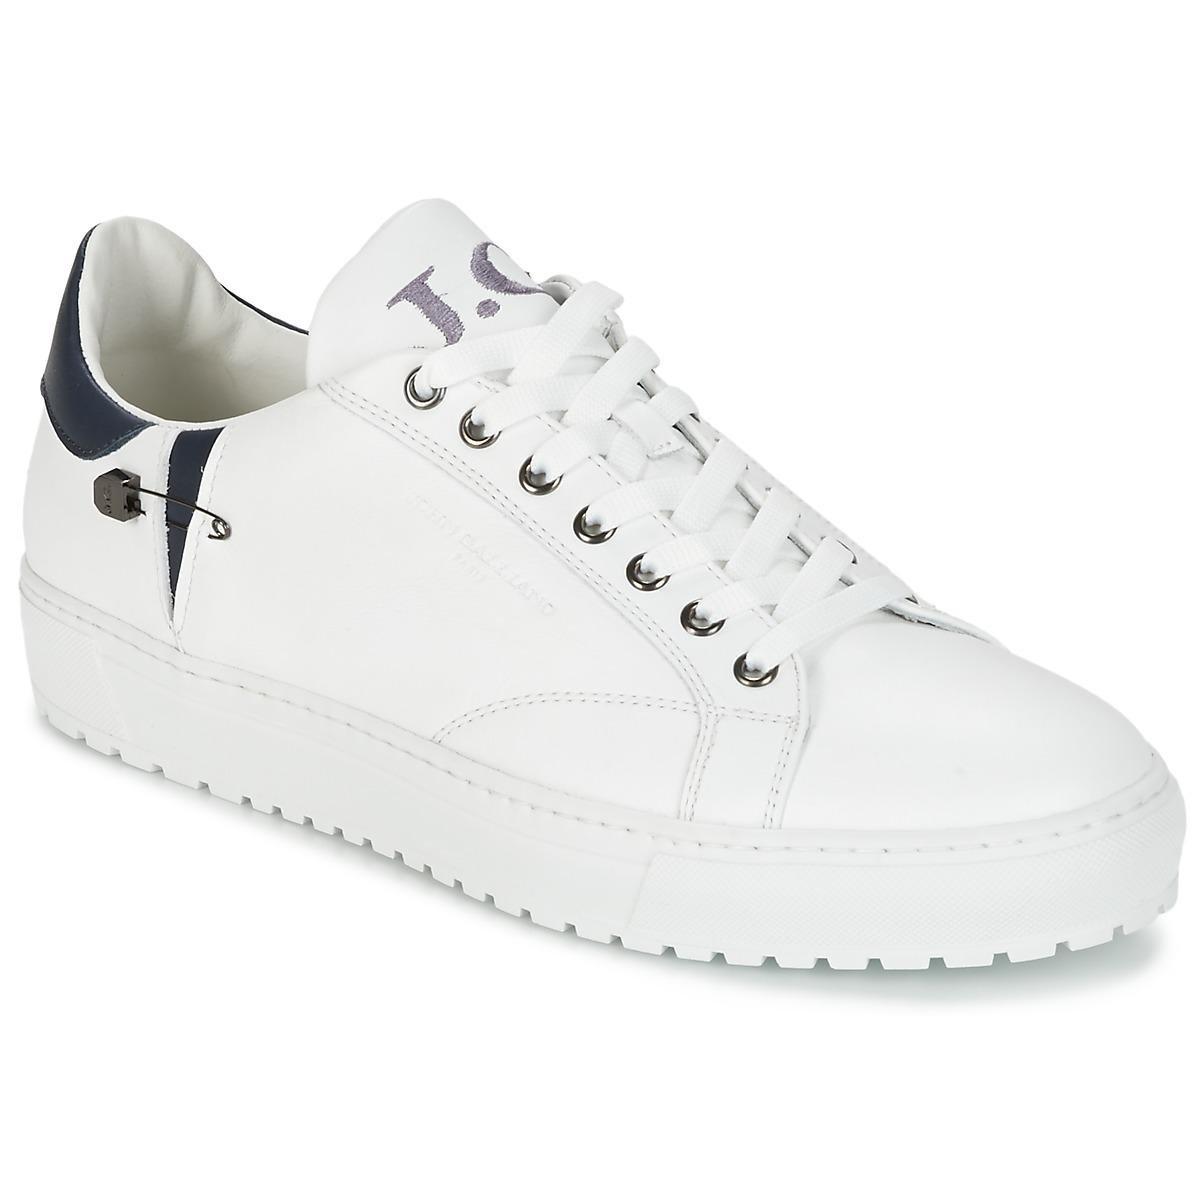 John Galliano 4752 Weiss Schuhe Sneaker Low Herren 245